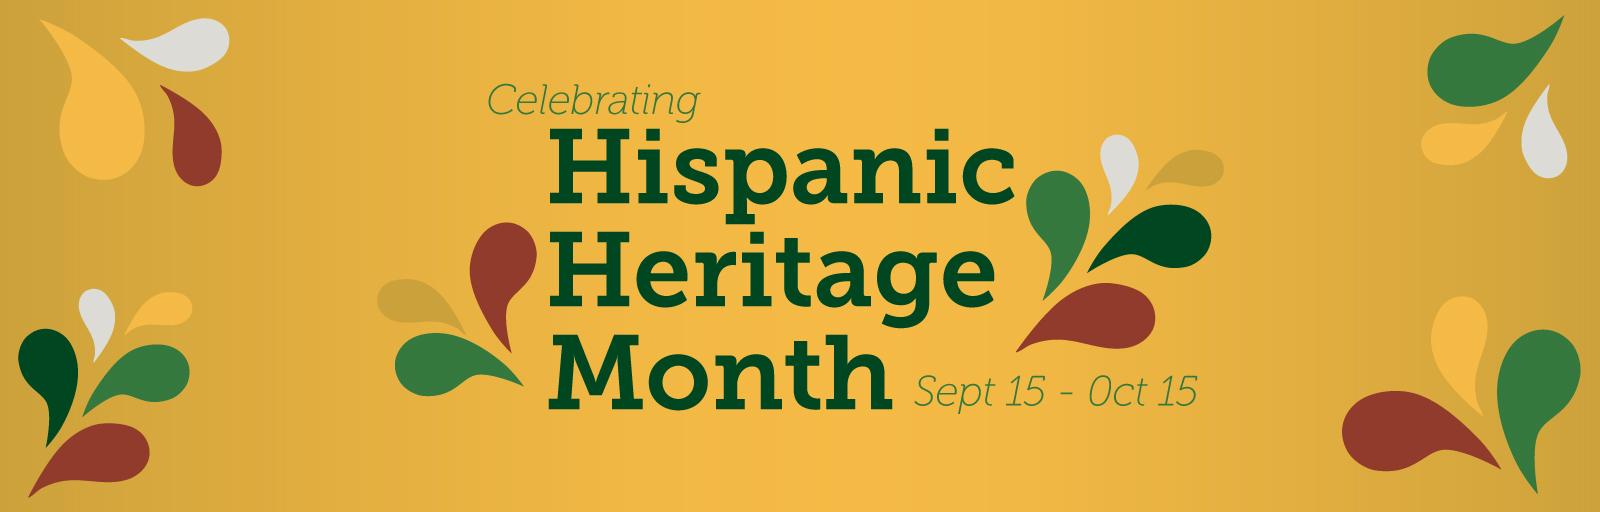 F19_Hispanic_Heritage_Month